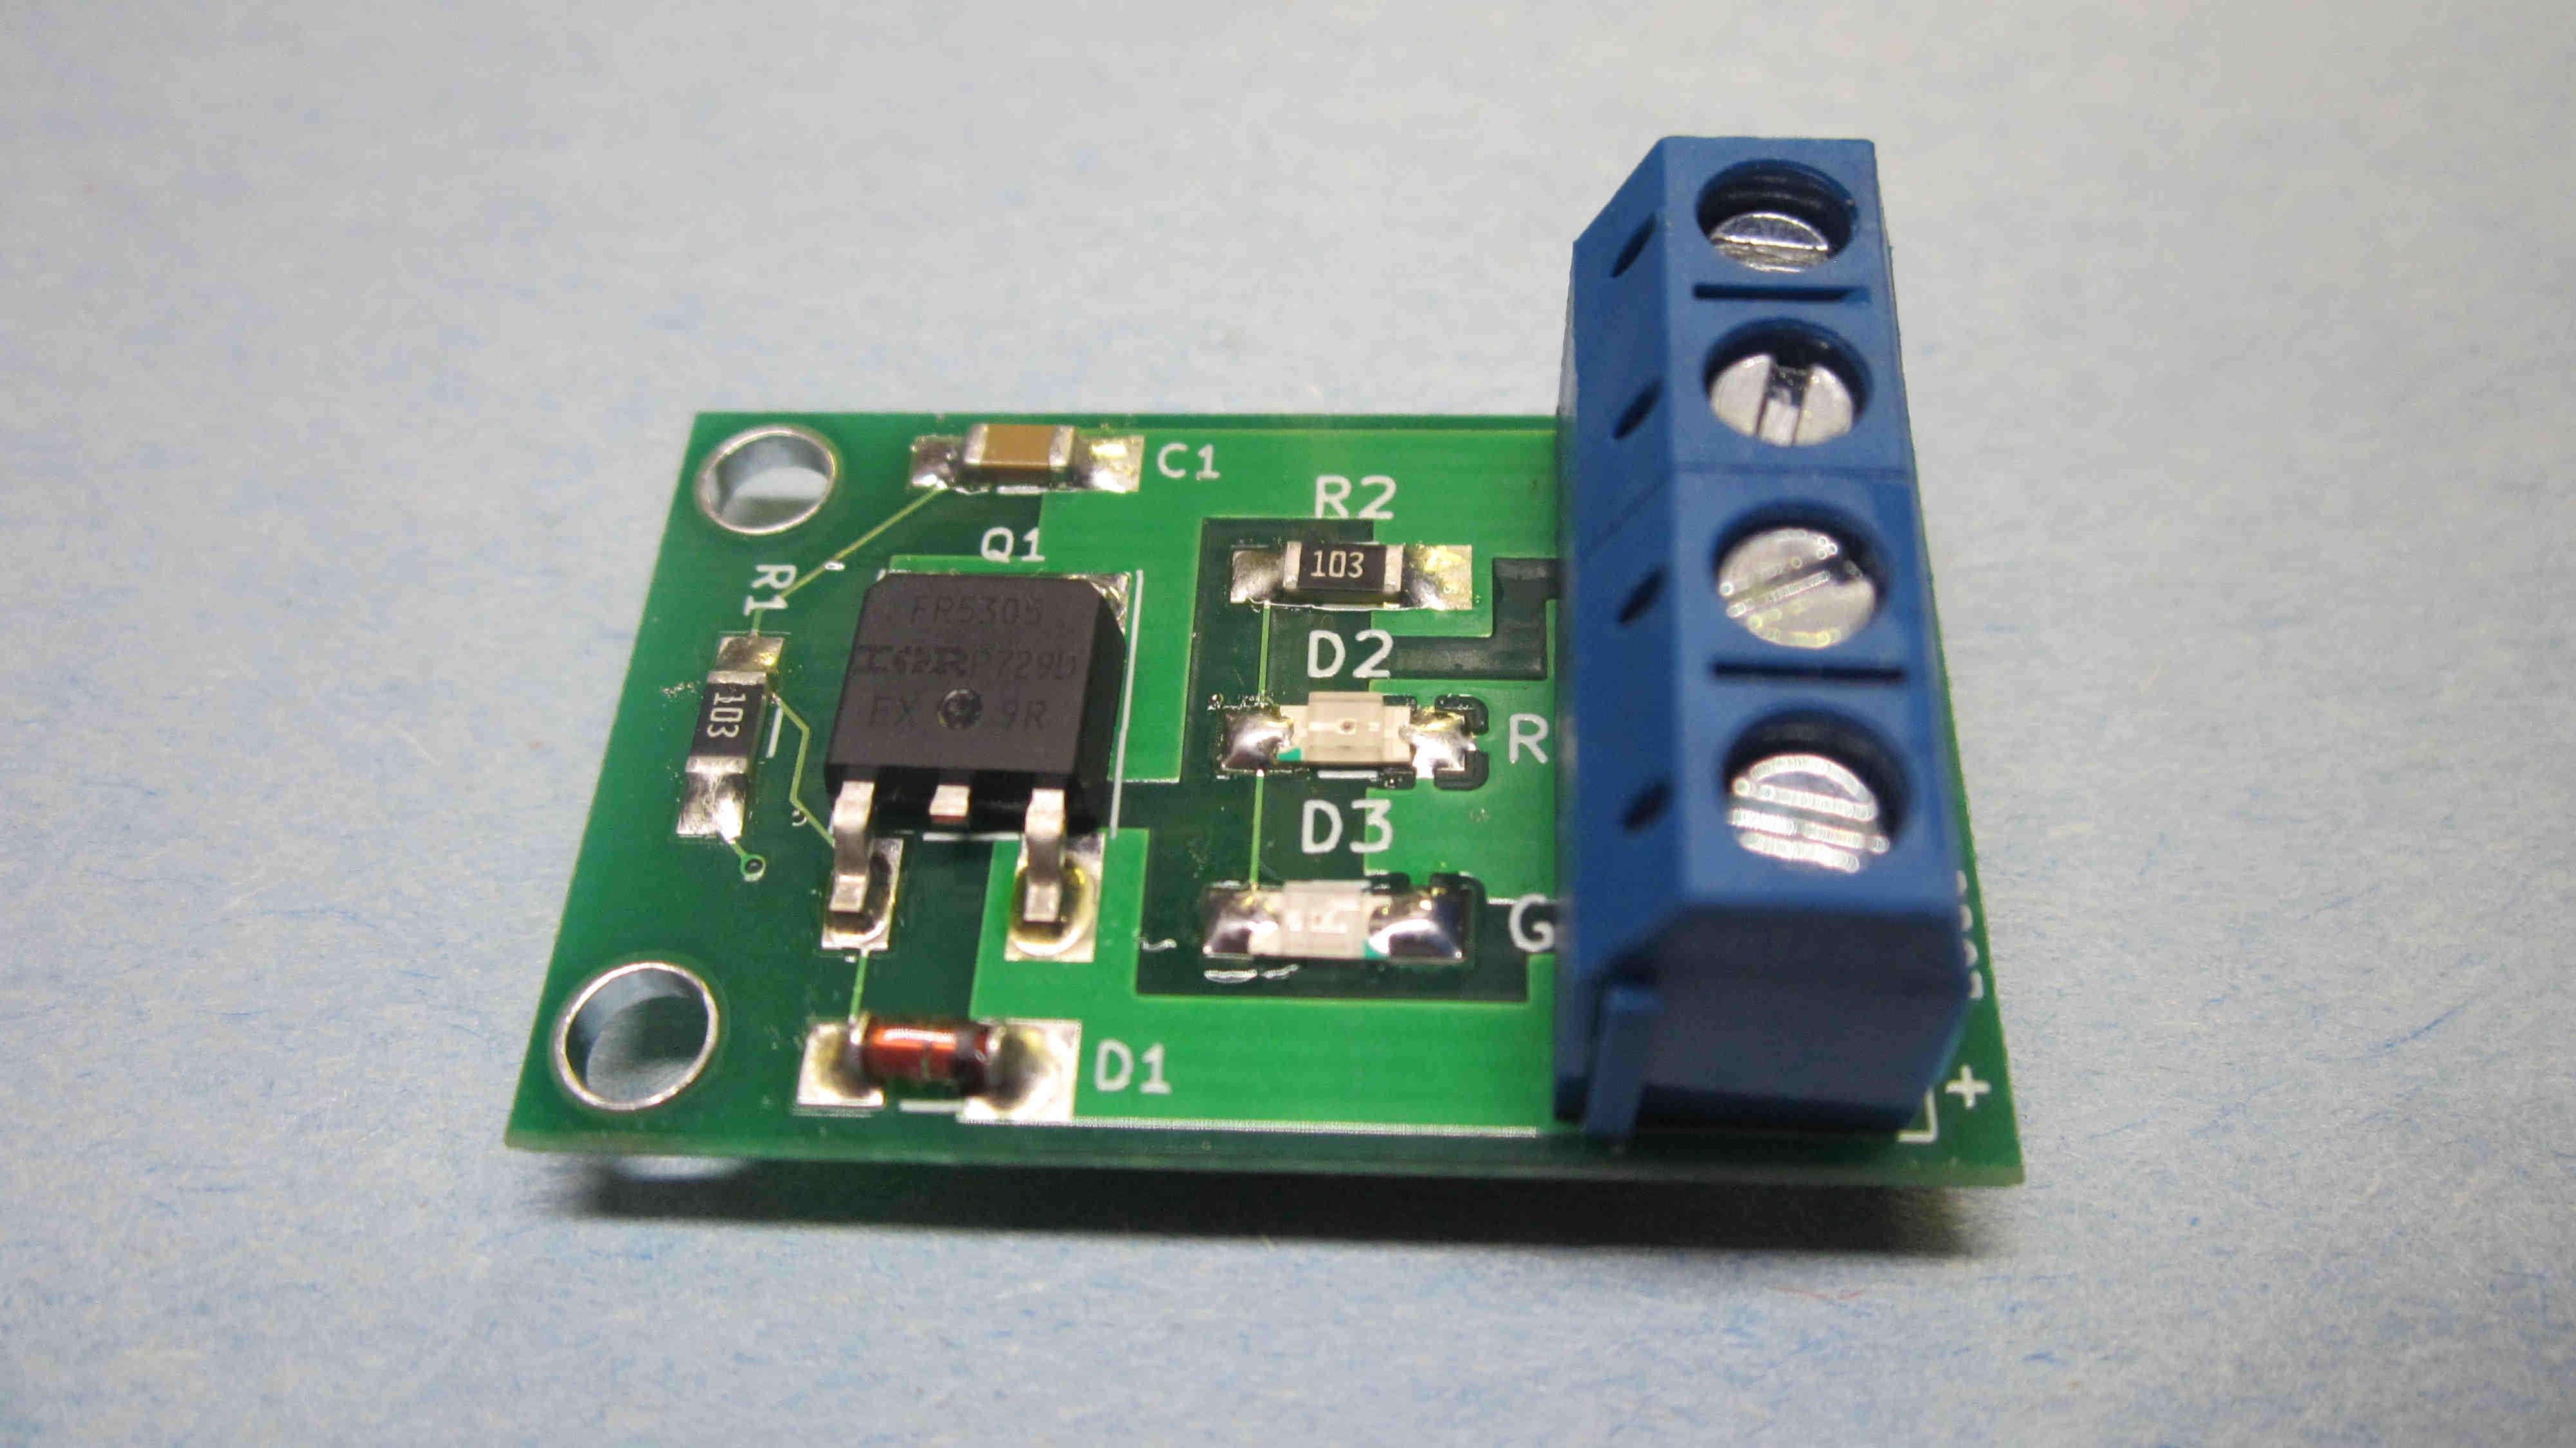 hook up capacitor backwards